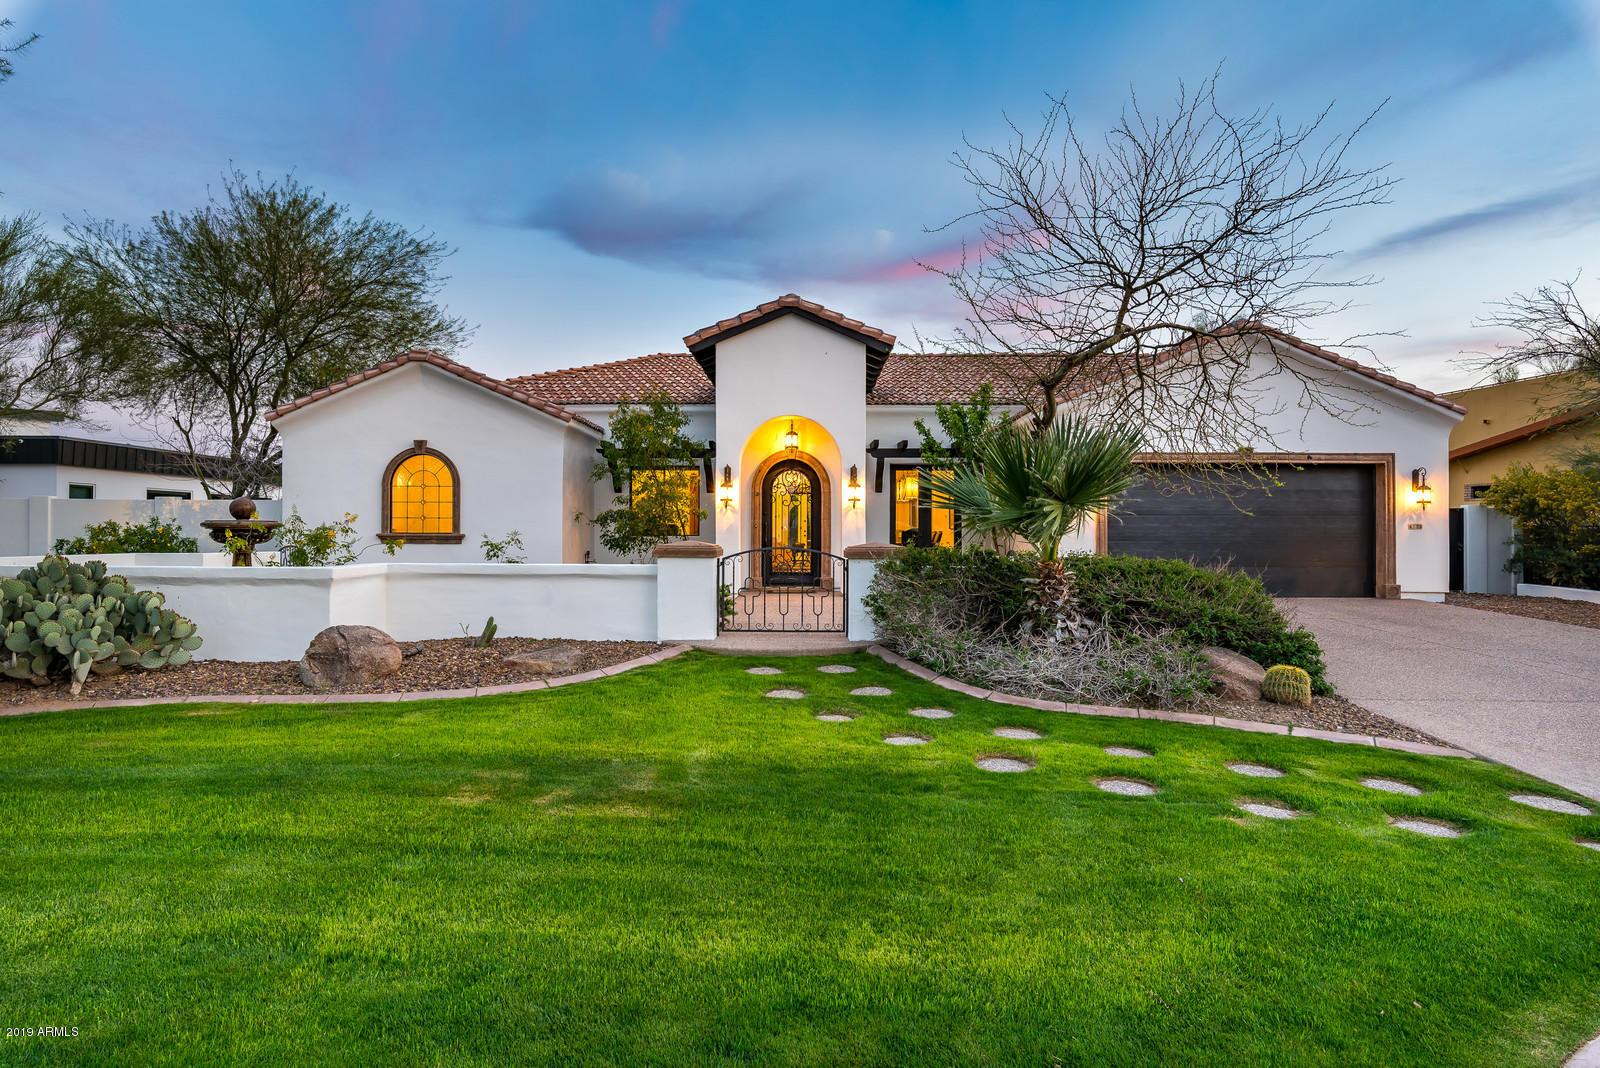 Photo of 4221 E MARION Way, Phoenix, AZ 85018